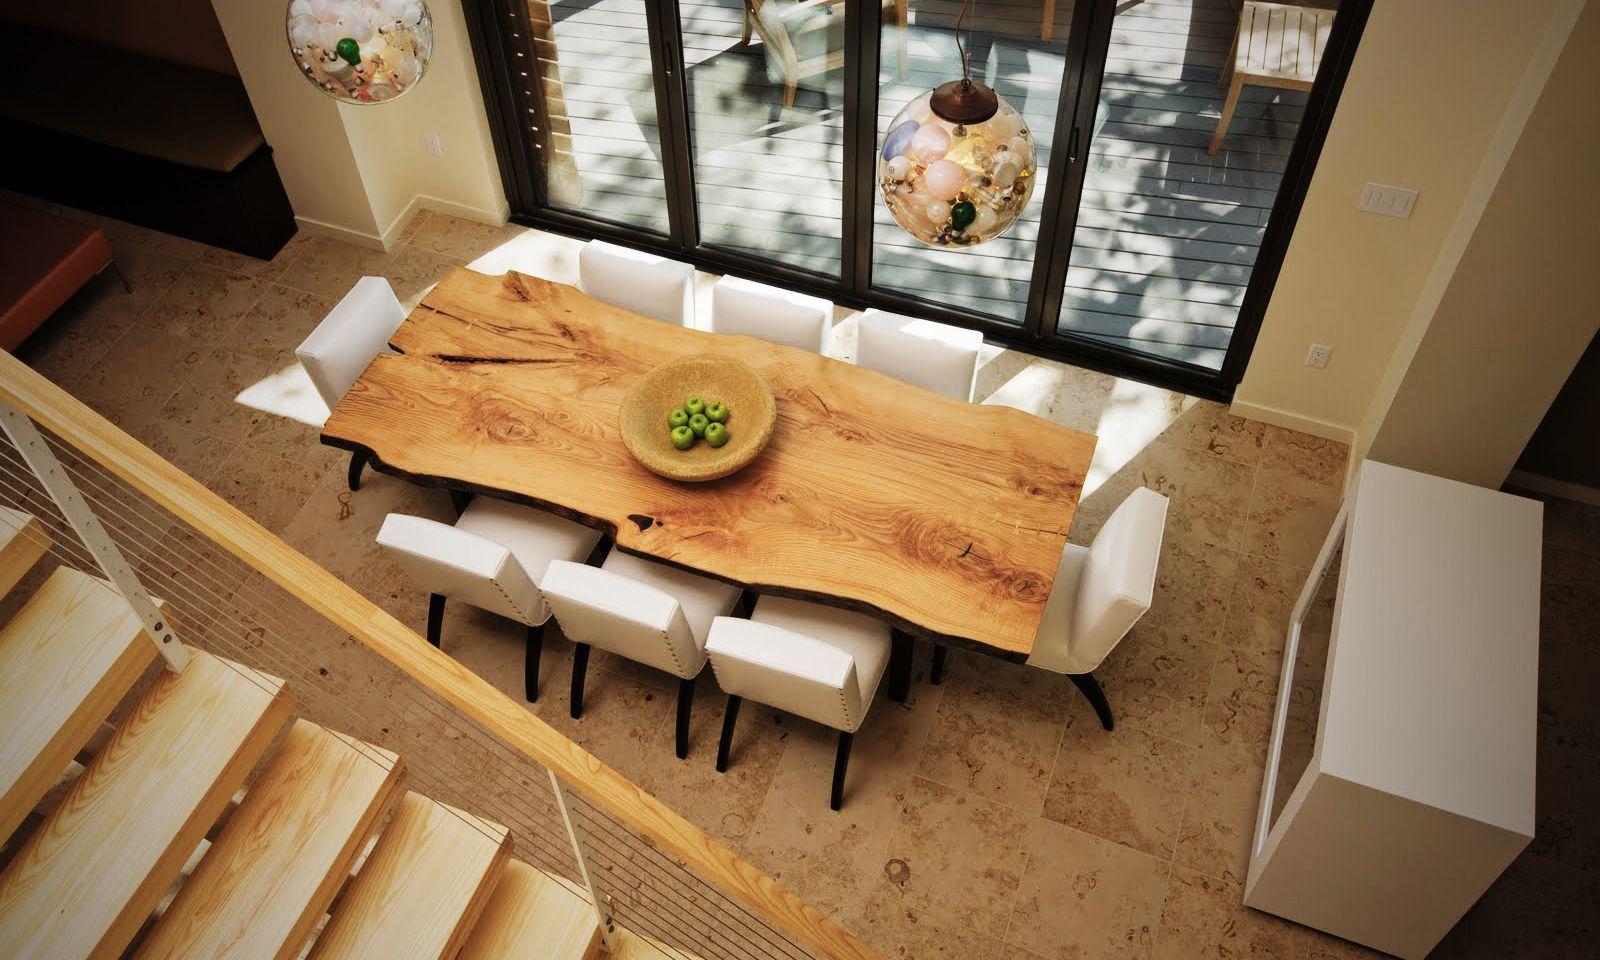 Live Edge In Interior Design Wood Dining Room Table Wood Slab Dining Table Dining Room Furnishings